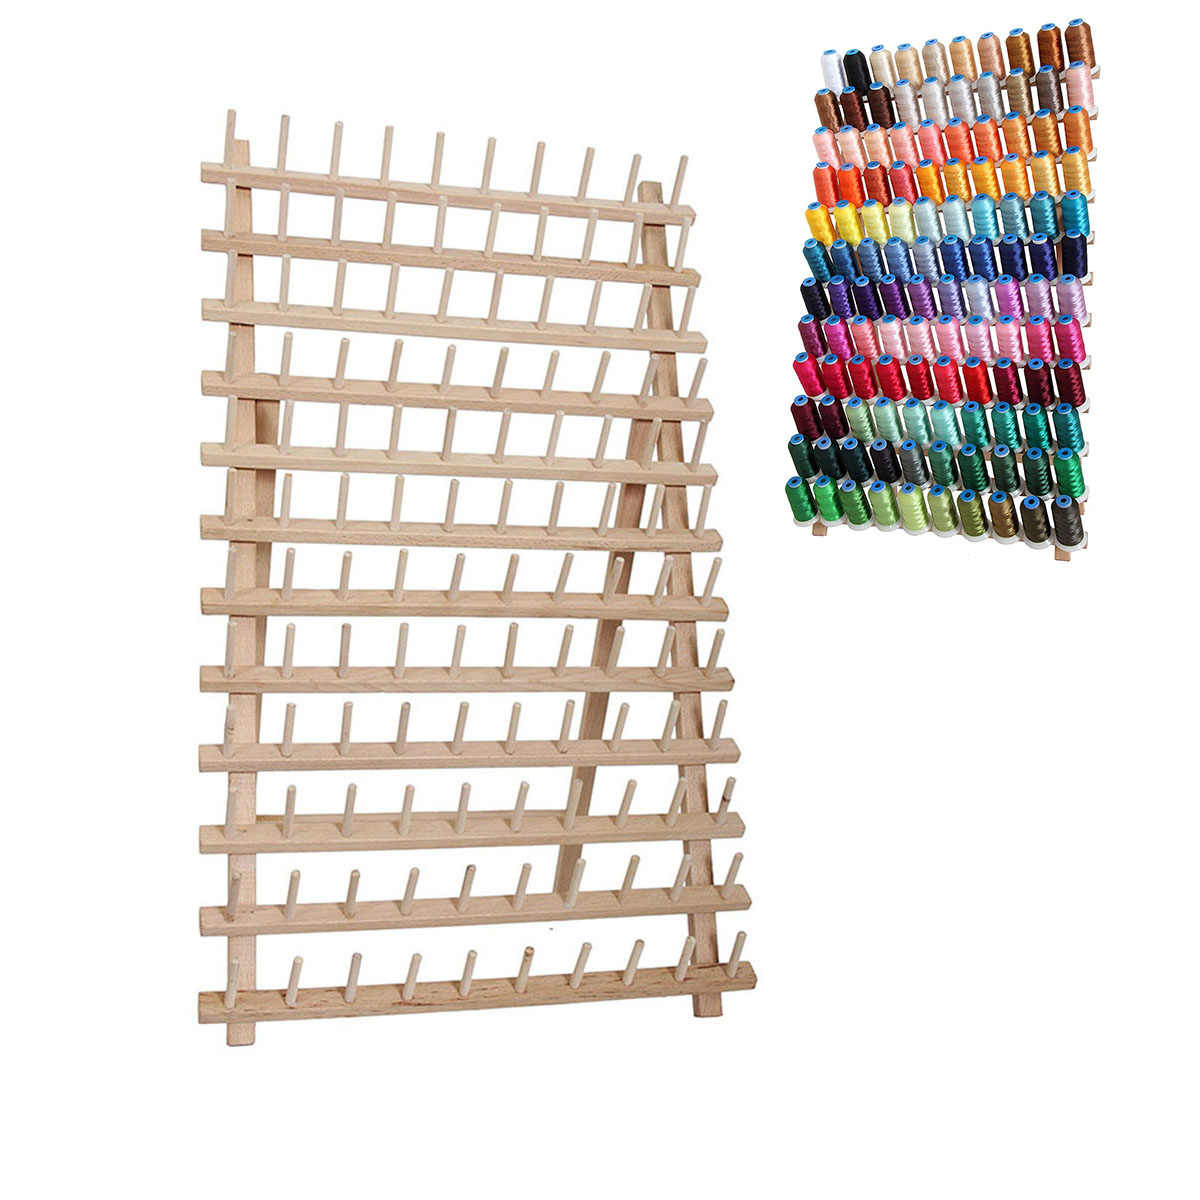 120 spool sewing tool thread rack